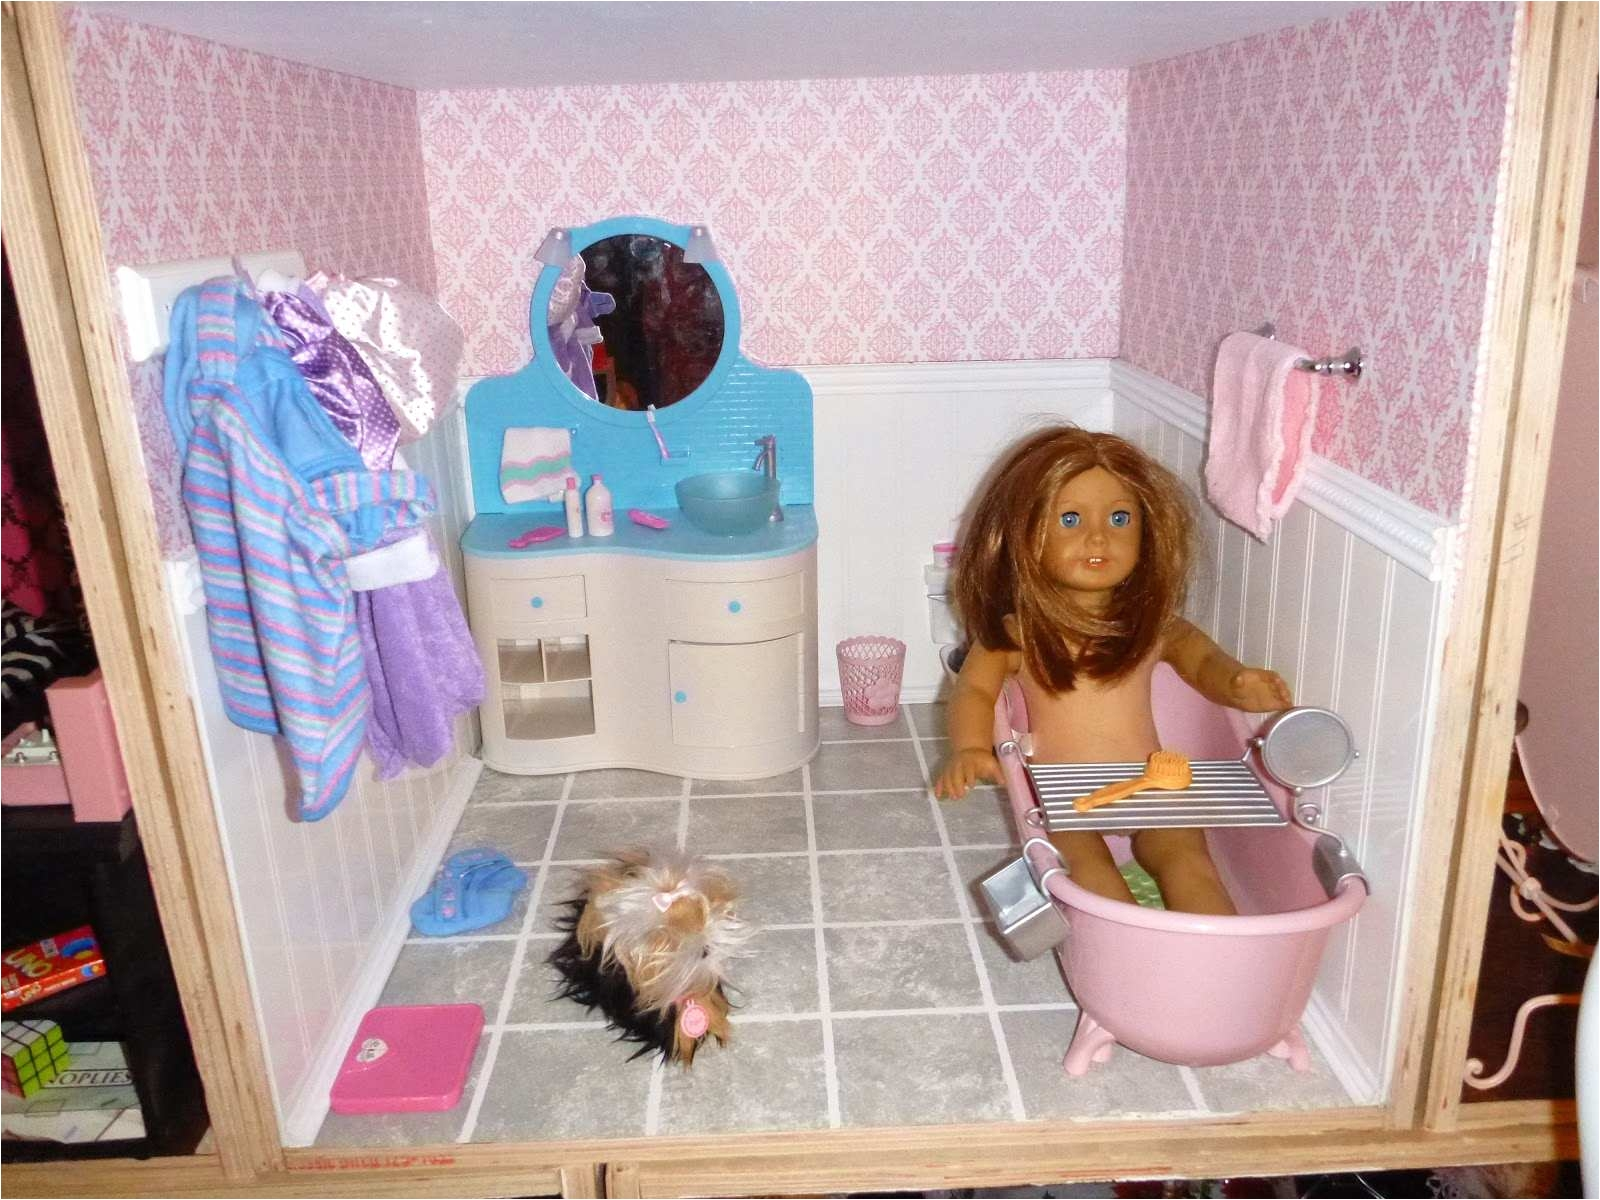 remarkable american girl doll bathroom set on american girl doll houses plans easybuildingplans 0d house plan